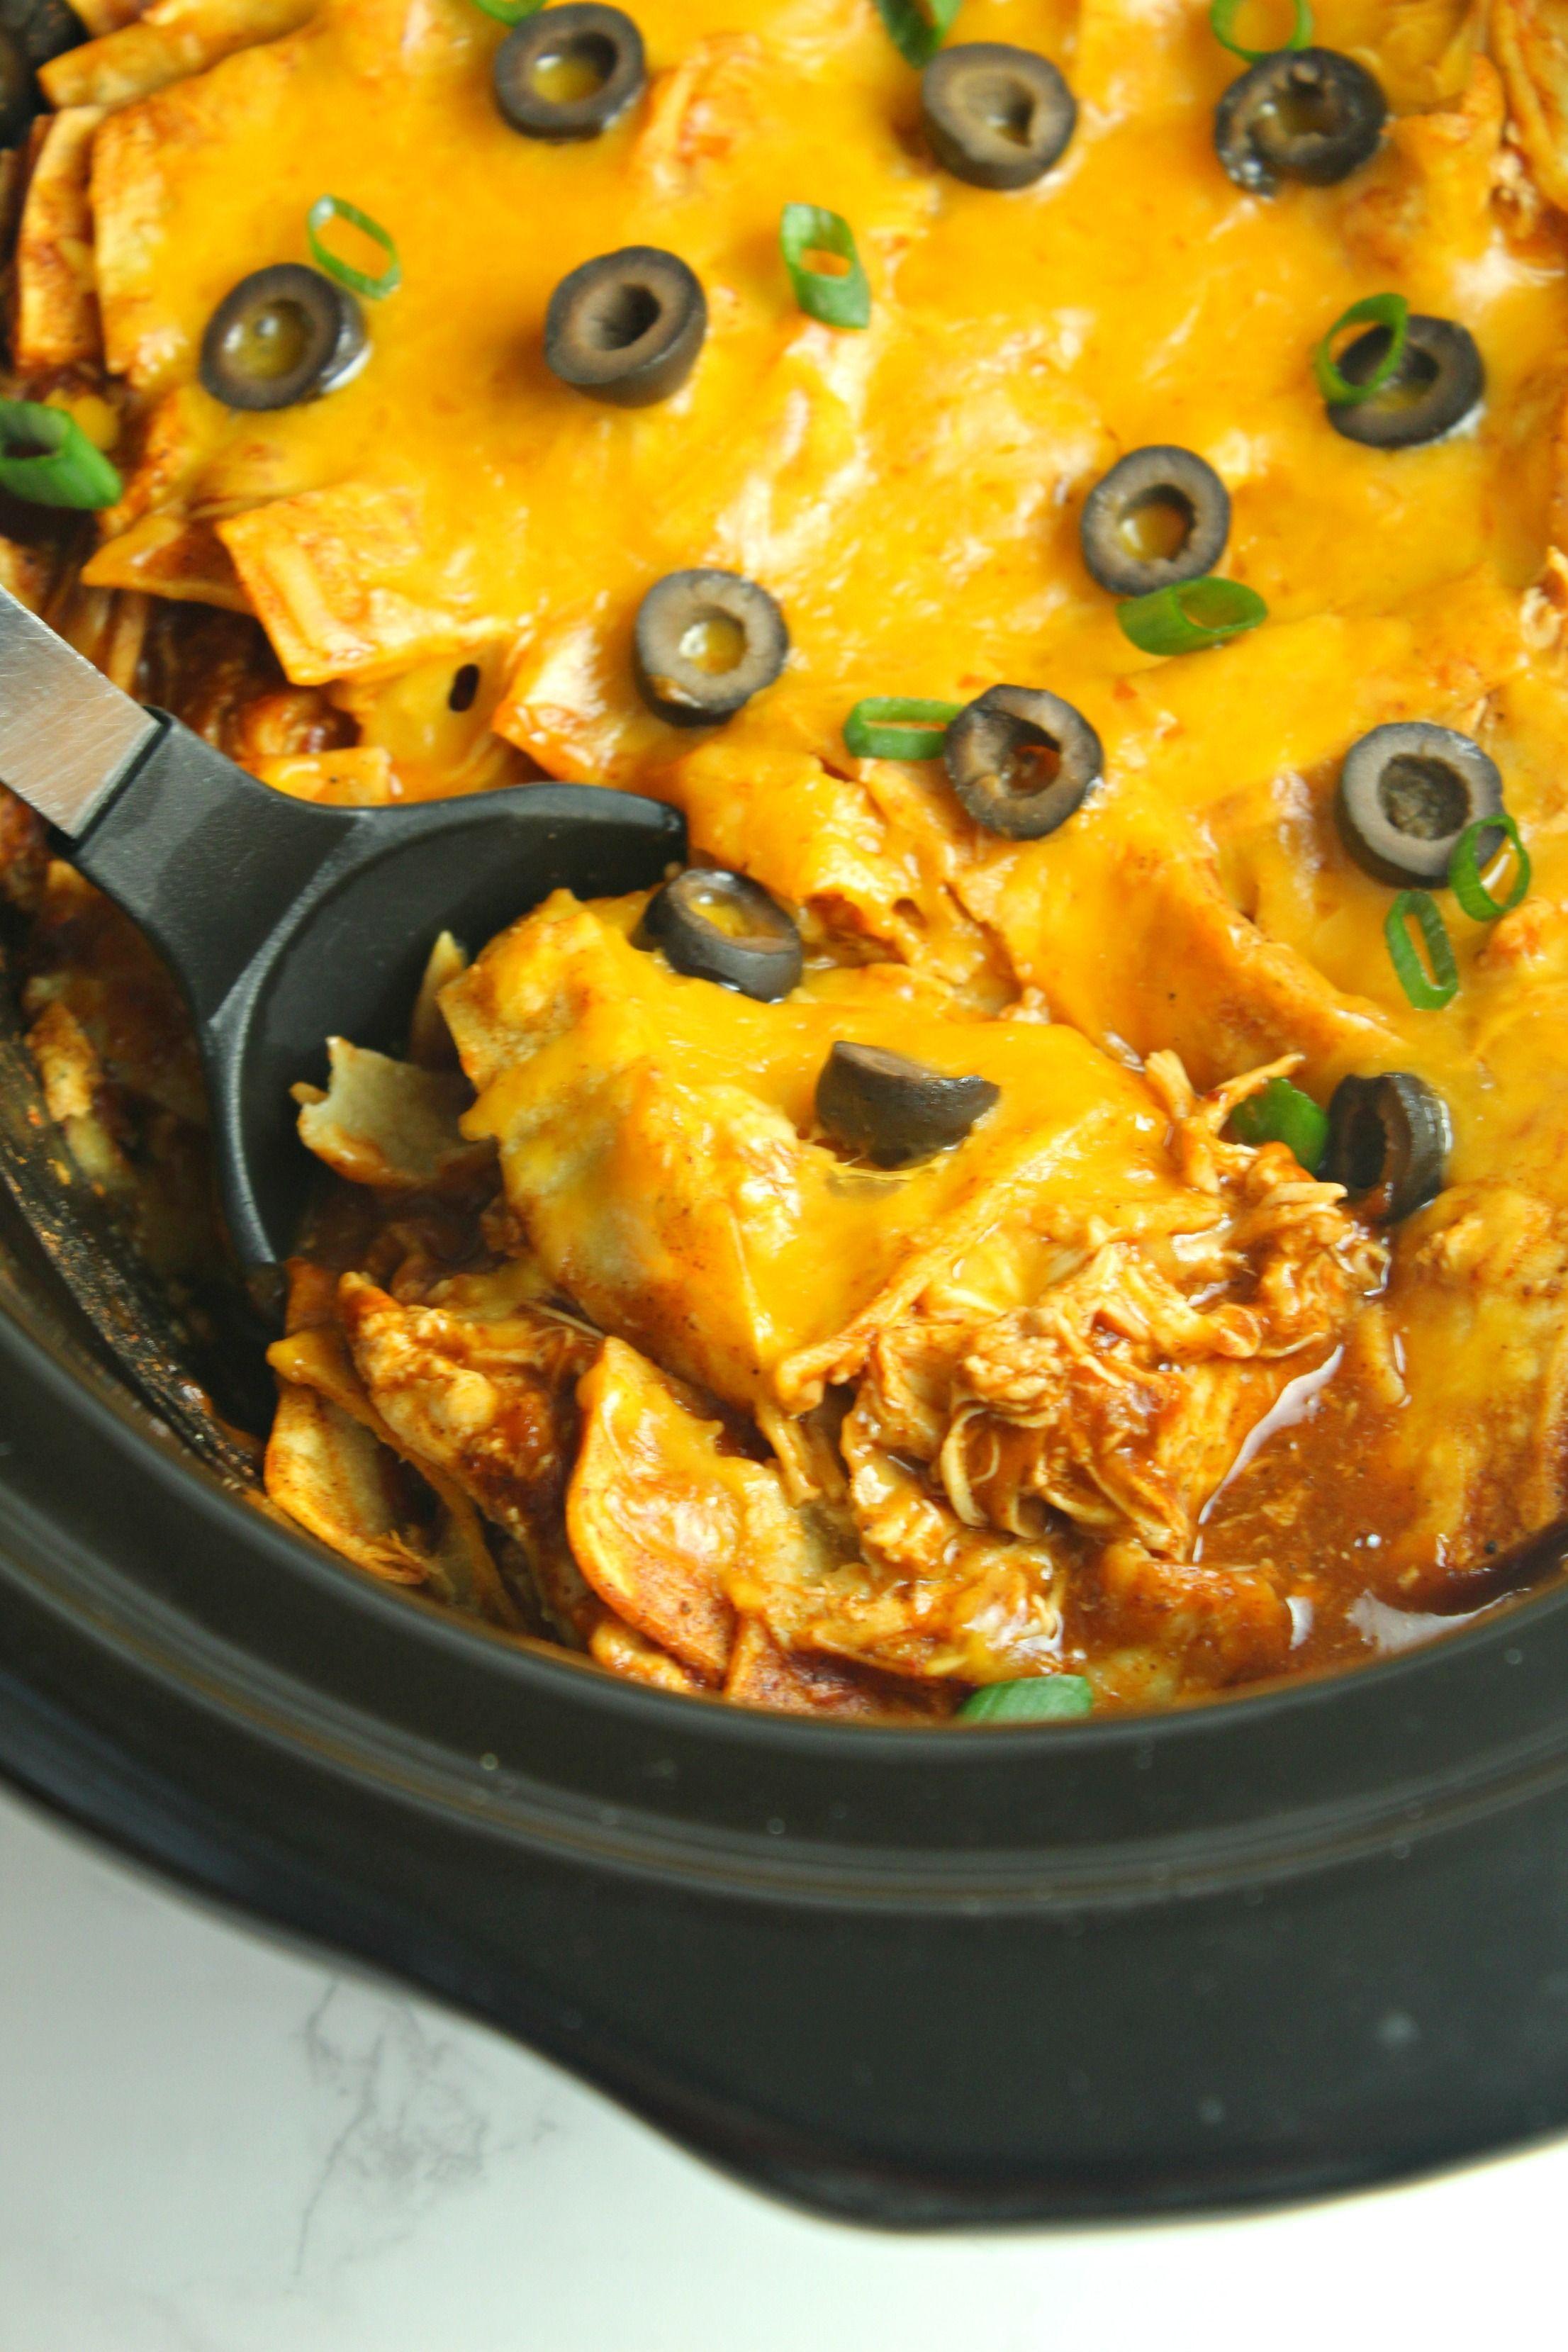 Photo of Slow Cooker Chicken Enchilada Casserole